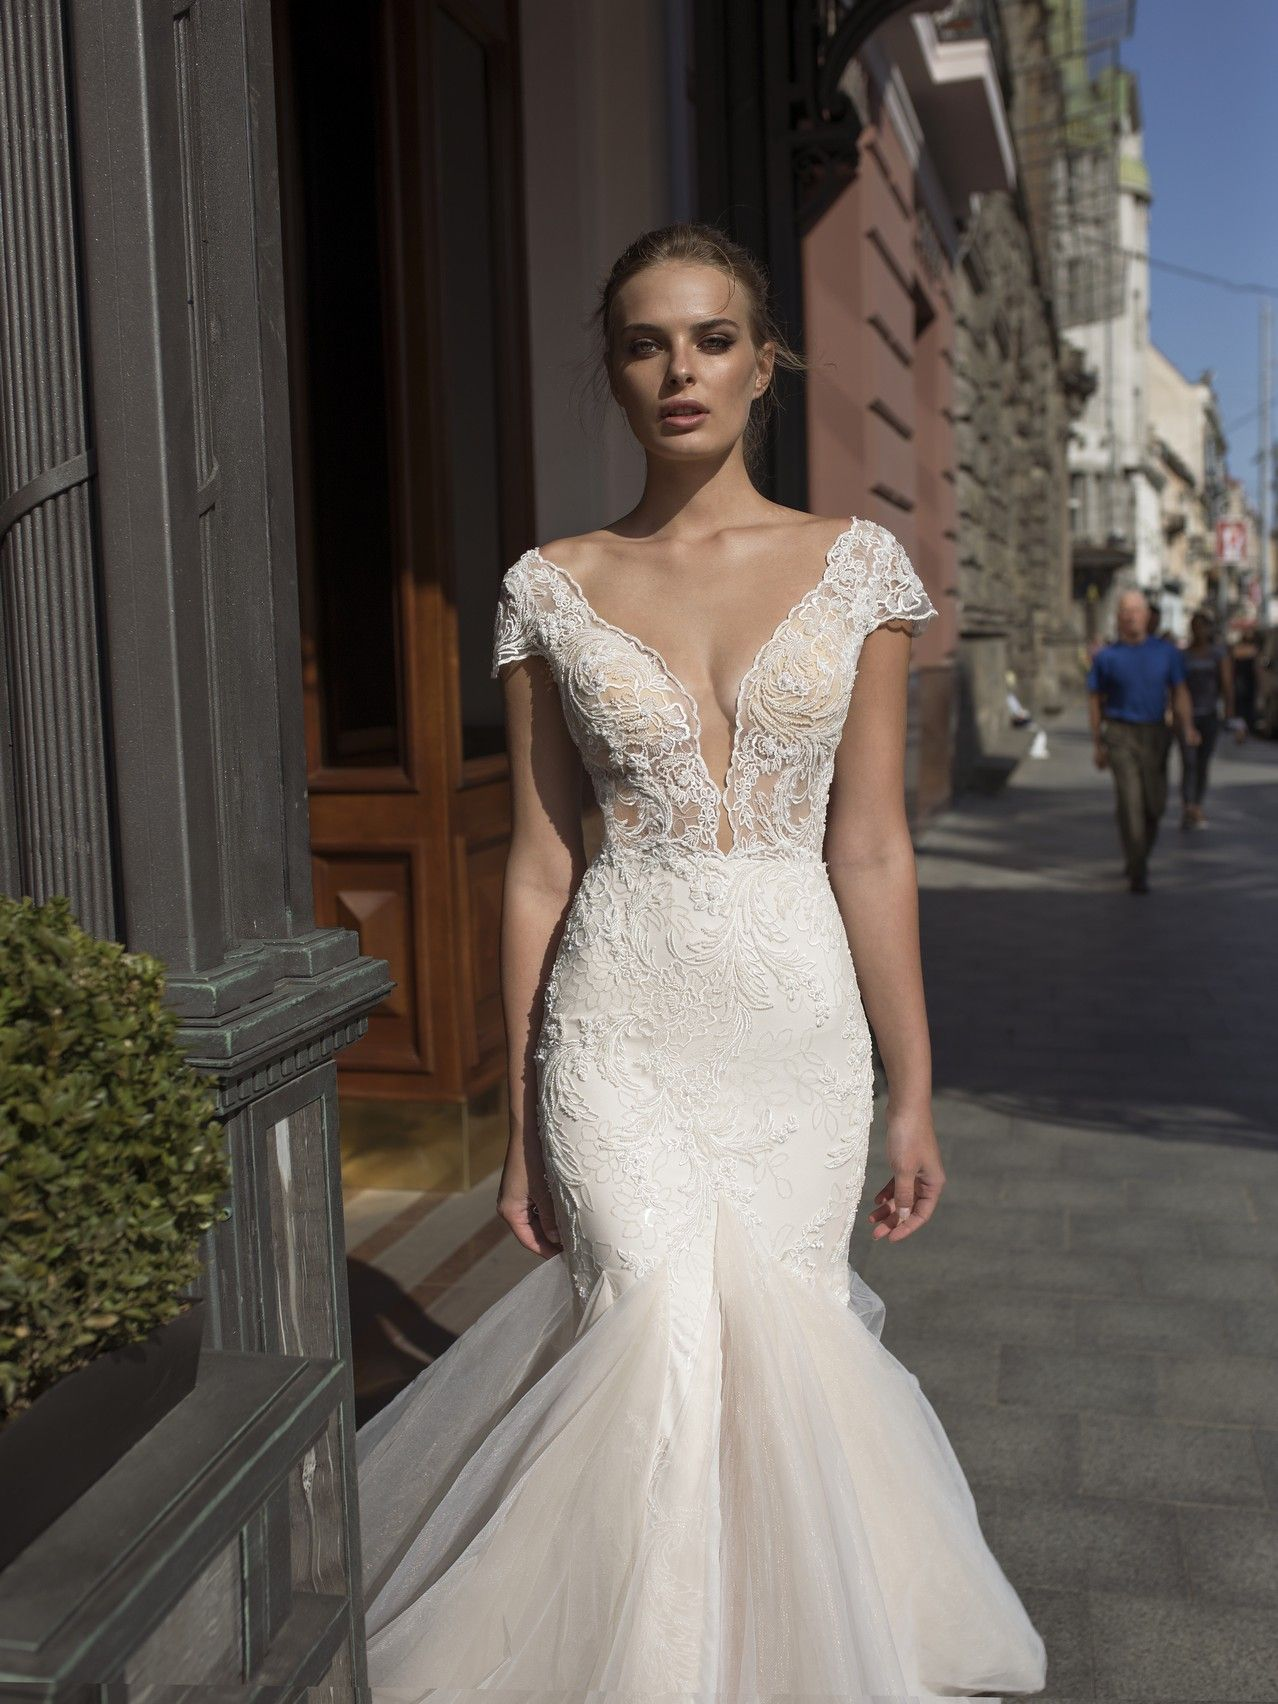 Loren Amor Collection Noya By Riki Dalal The Boutique By B Belle Events Ig B Wedding Dress Necklines Plunging Neckline Wedding Dress Fitted Wedding Dress